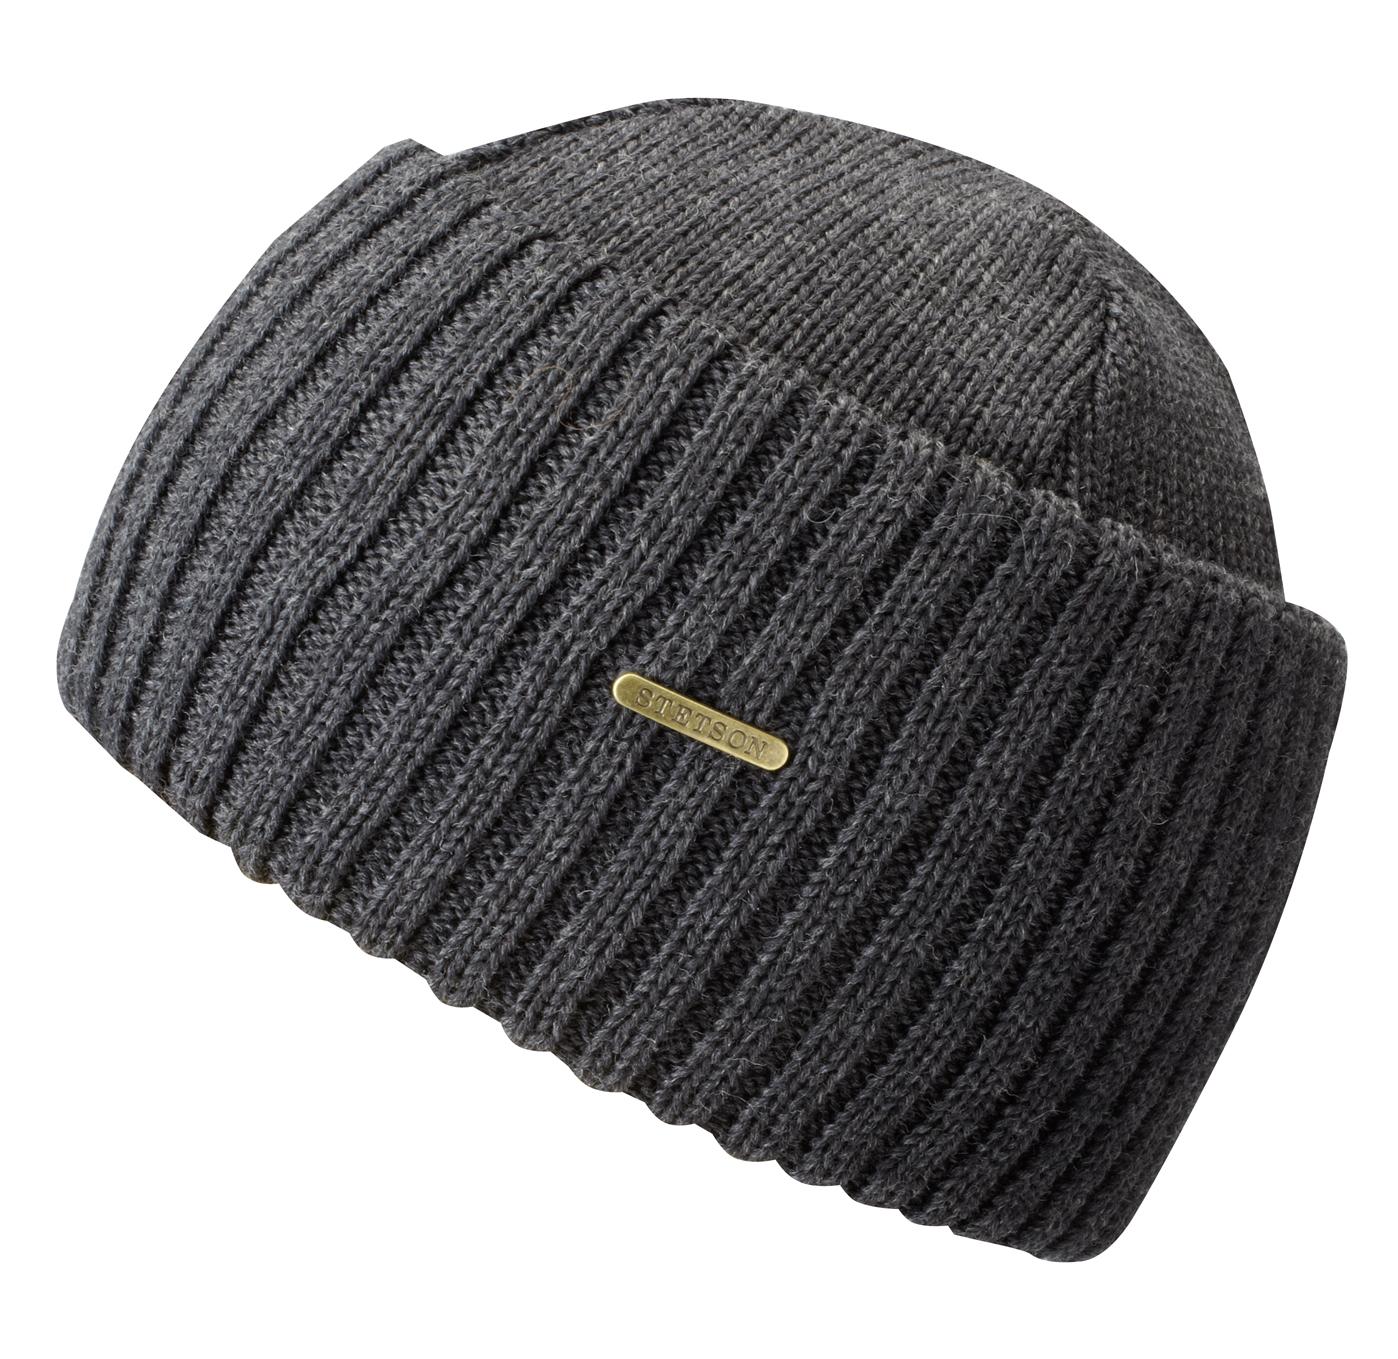 Bonnet en tricot Northport Merino Wool Stetson gris - Kausia da5faea805a